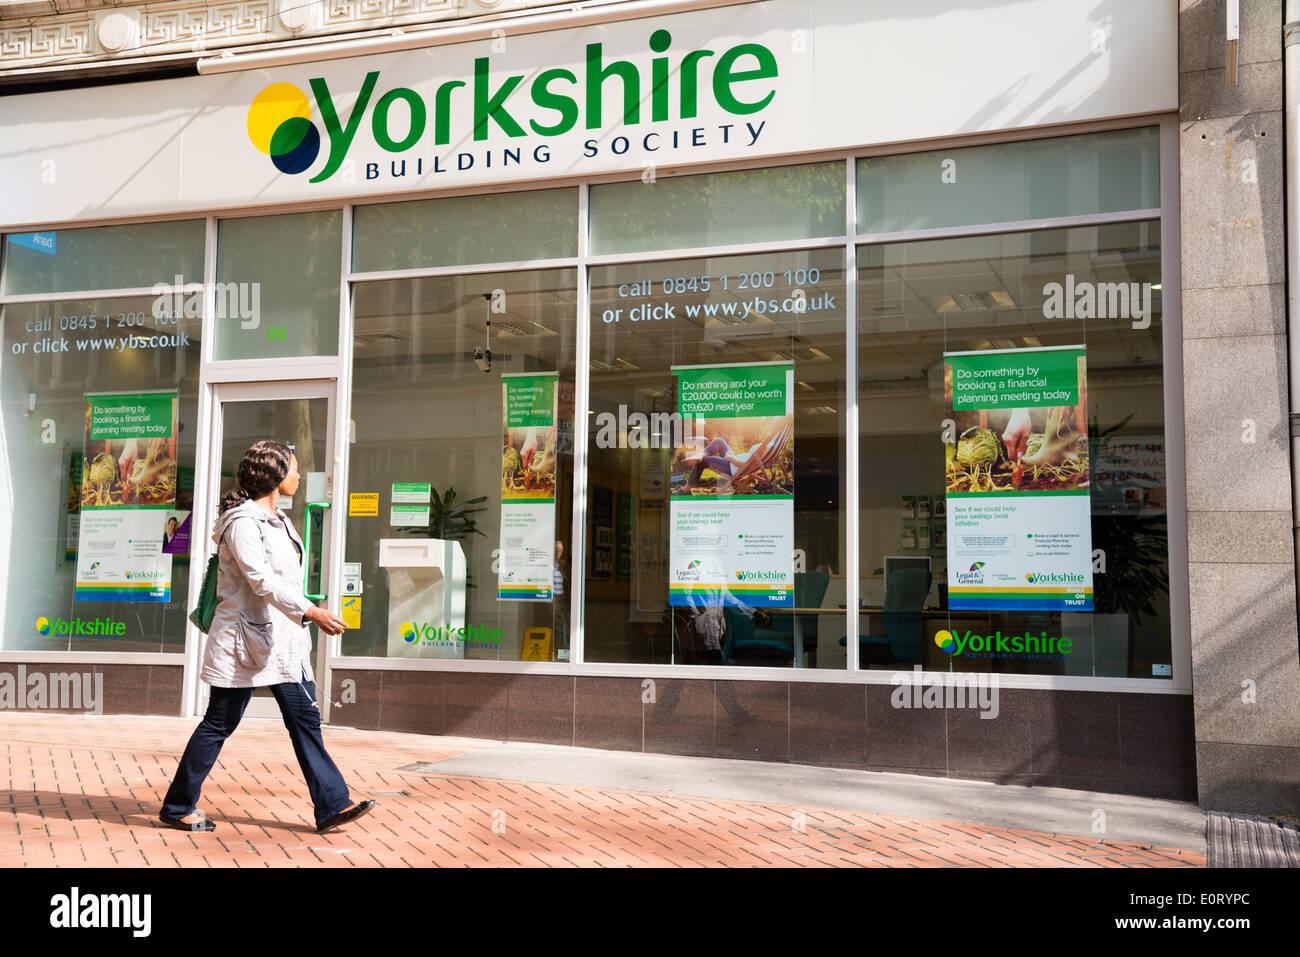 Yorkshire Building Society in Birmingham City Centre, UK. - Stock Image